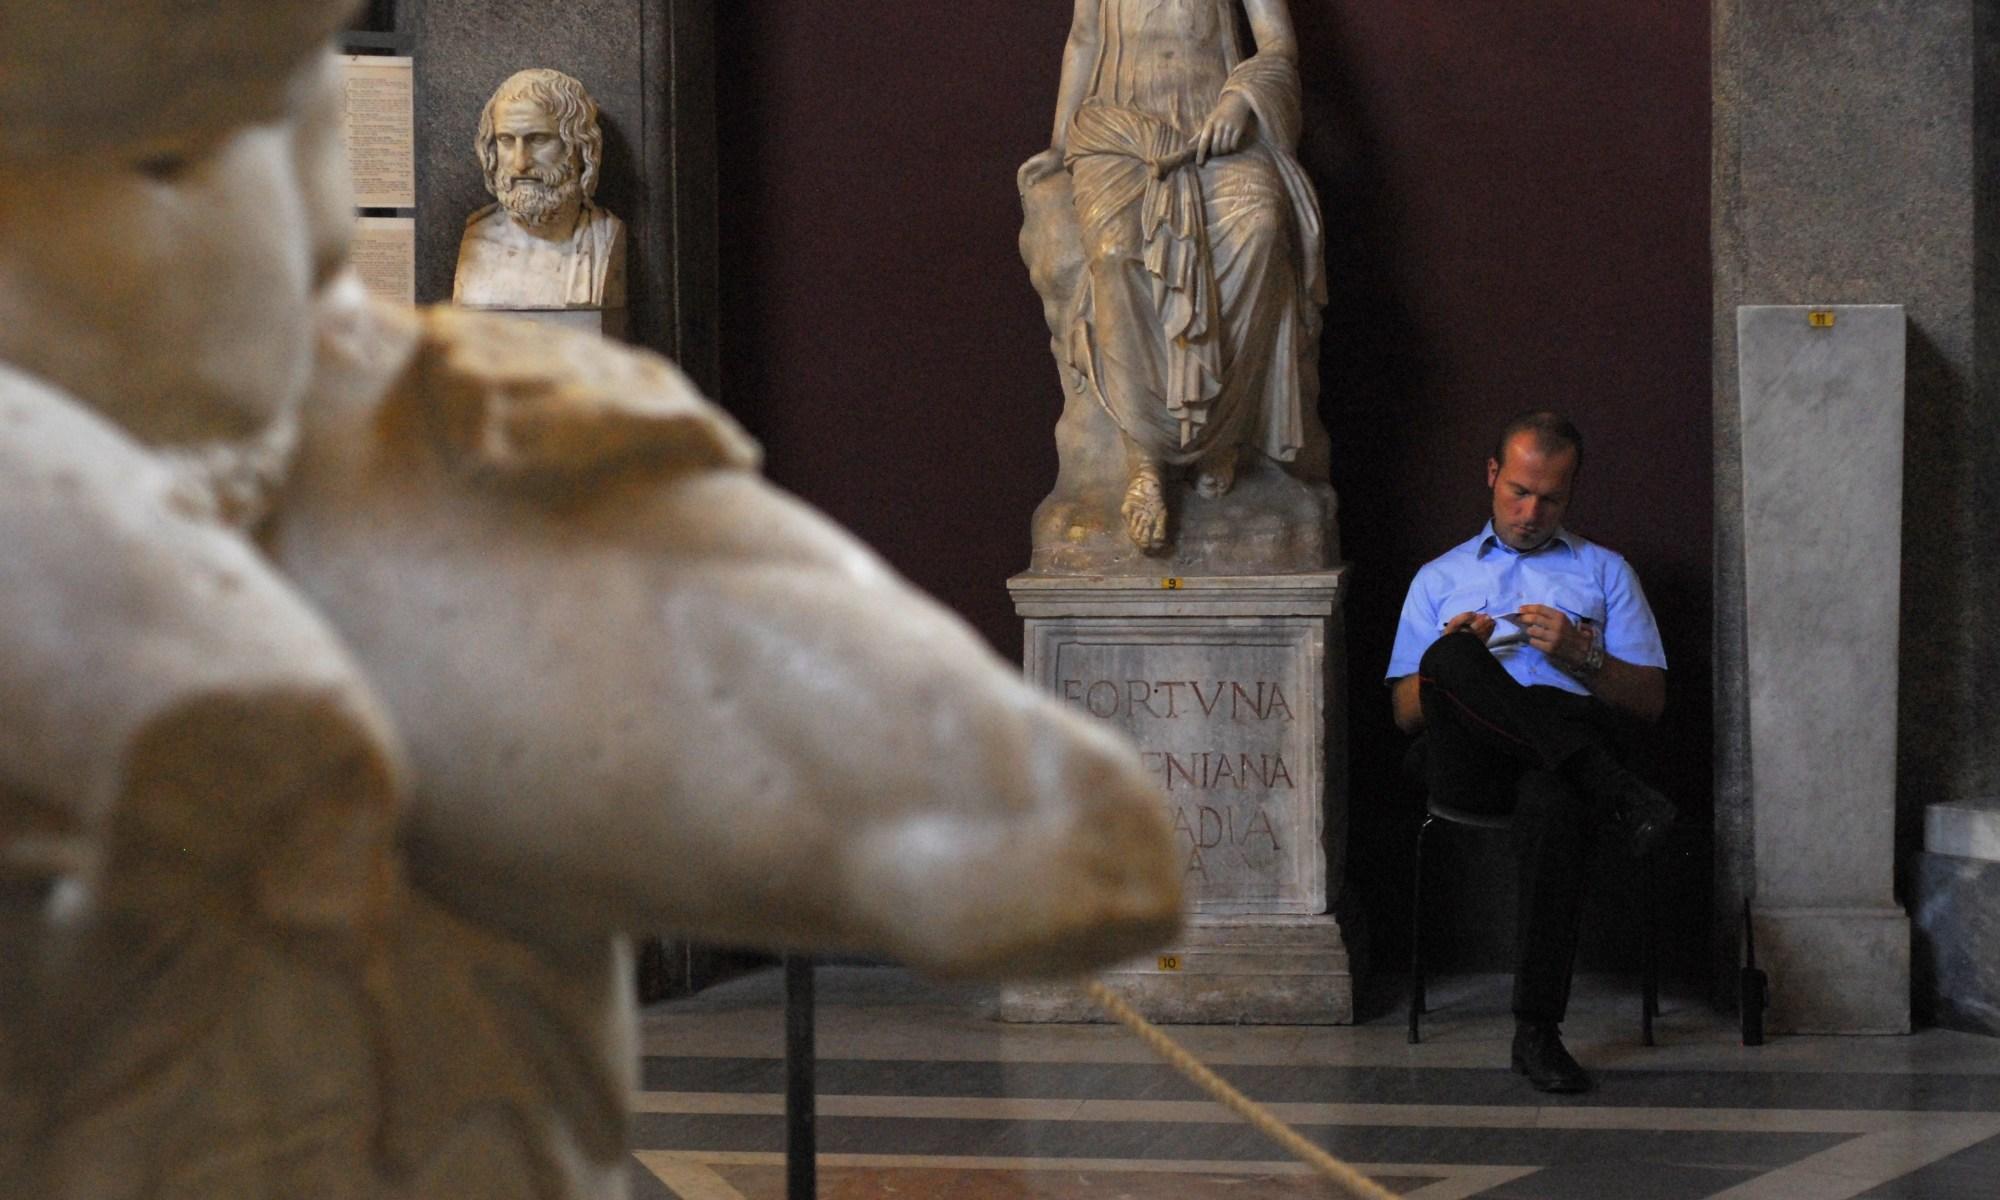 Security guard in Vatican